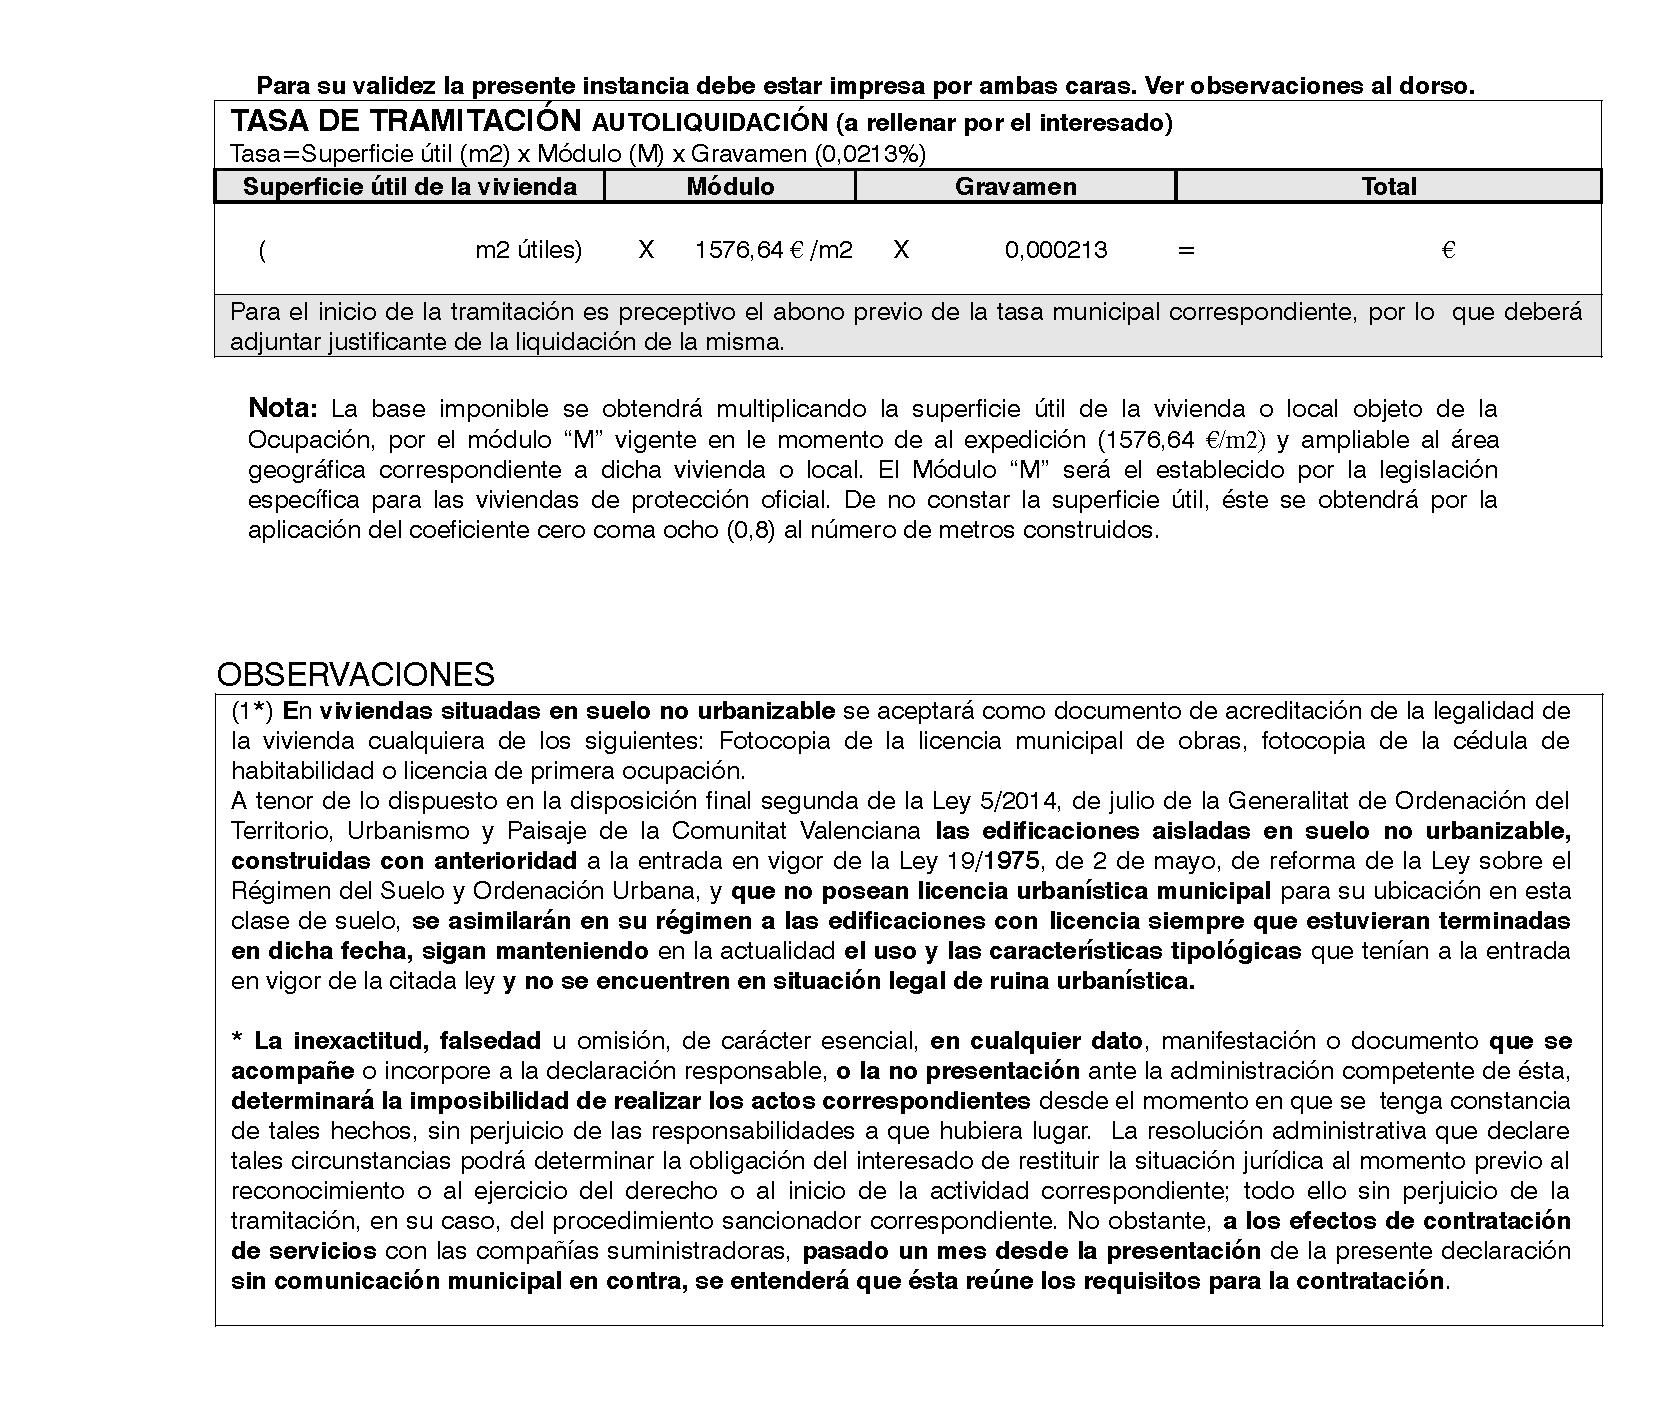 Impreso Declaración Responsable Segunda Ocupación San Vicente del Raspeig